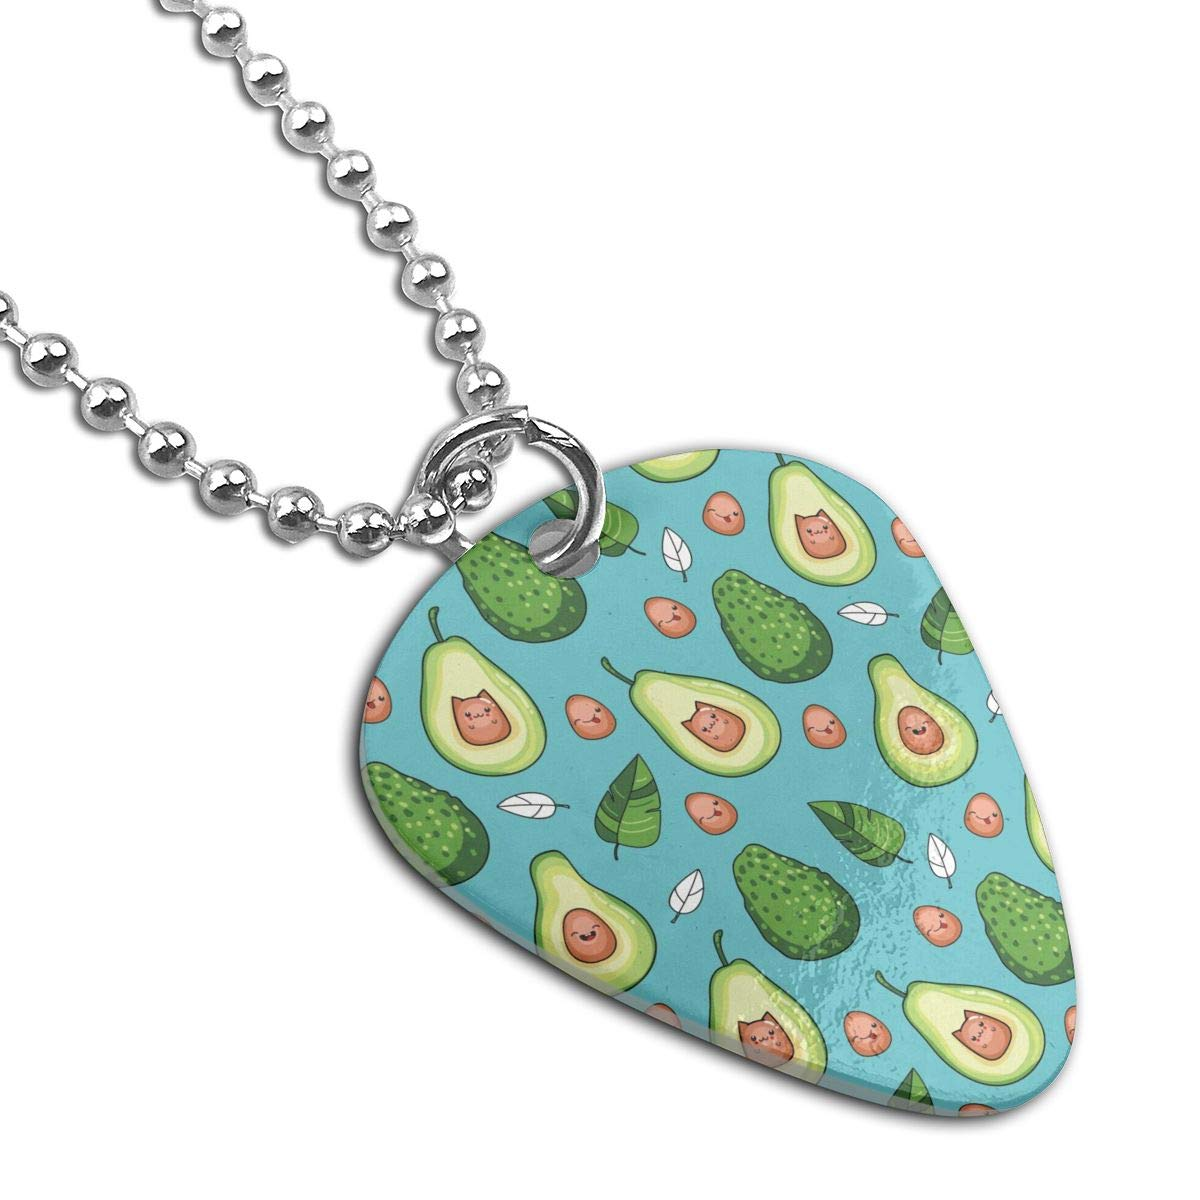 Avocado Fruit Kawaii Custom Guitar Pick Pendant Necklace Keychain